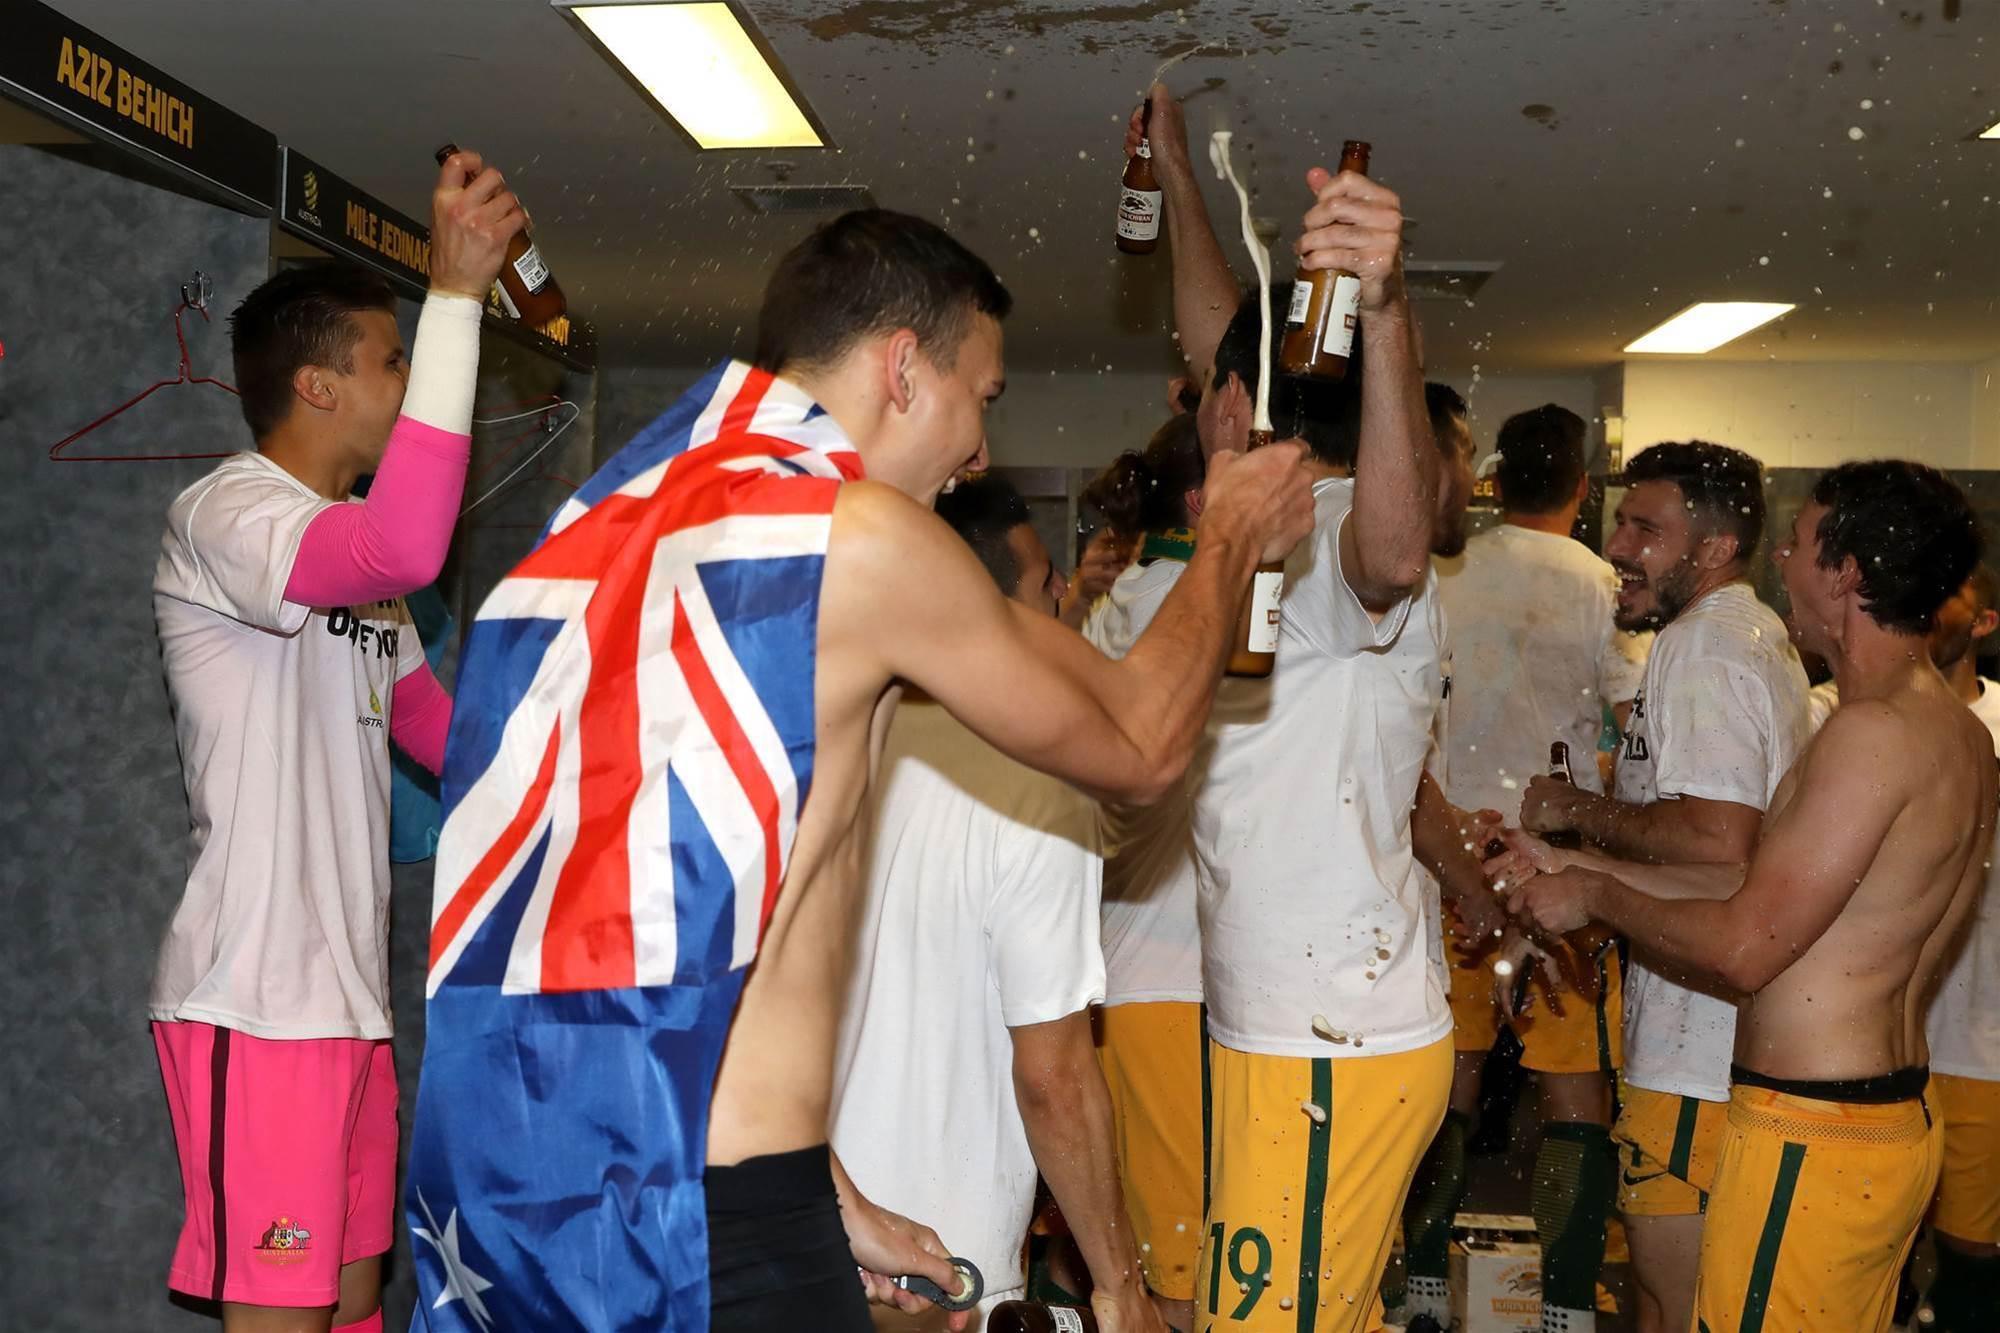 Cue delirium! Socceroos, fans celebration pics